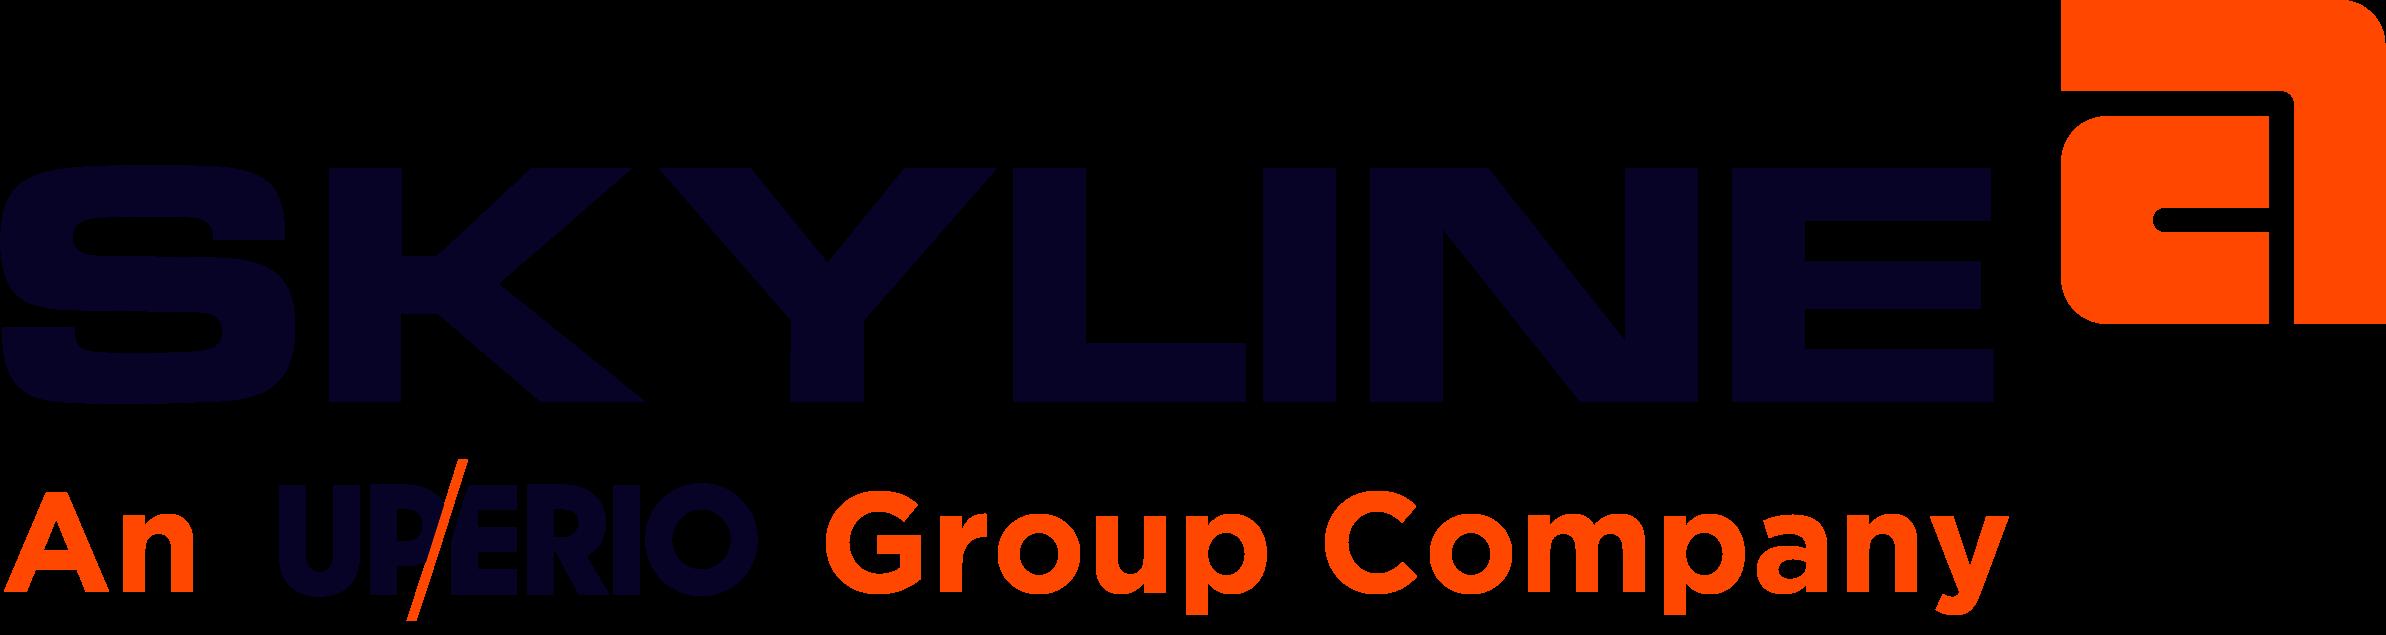 Logo Skyline - An Uperio company